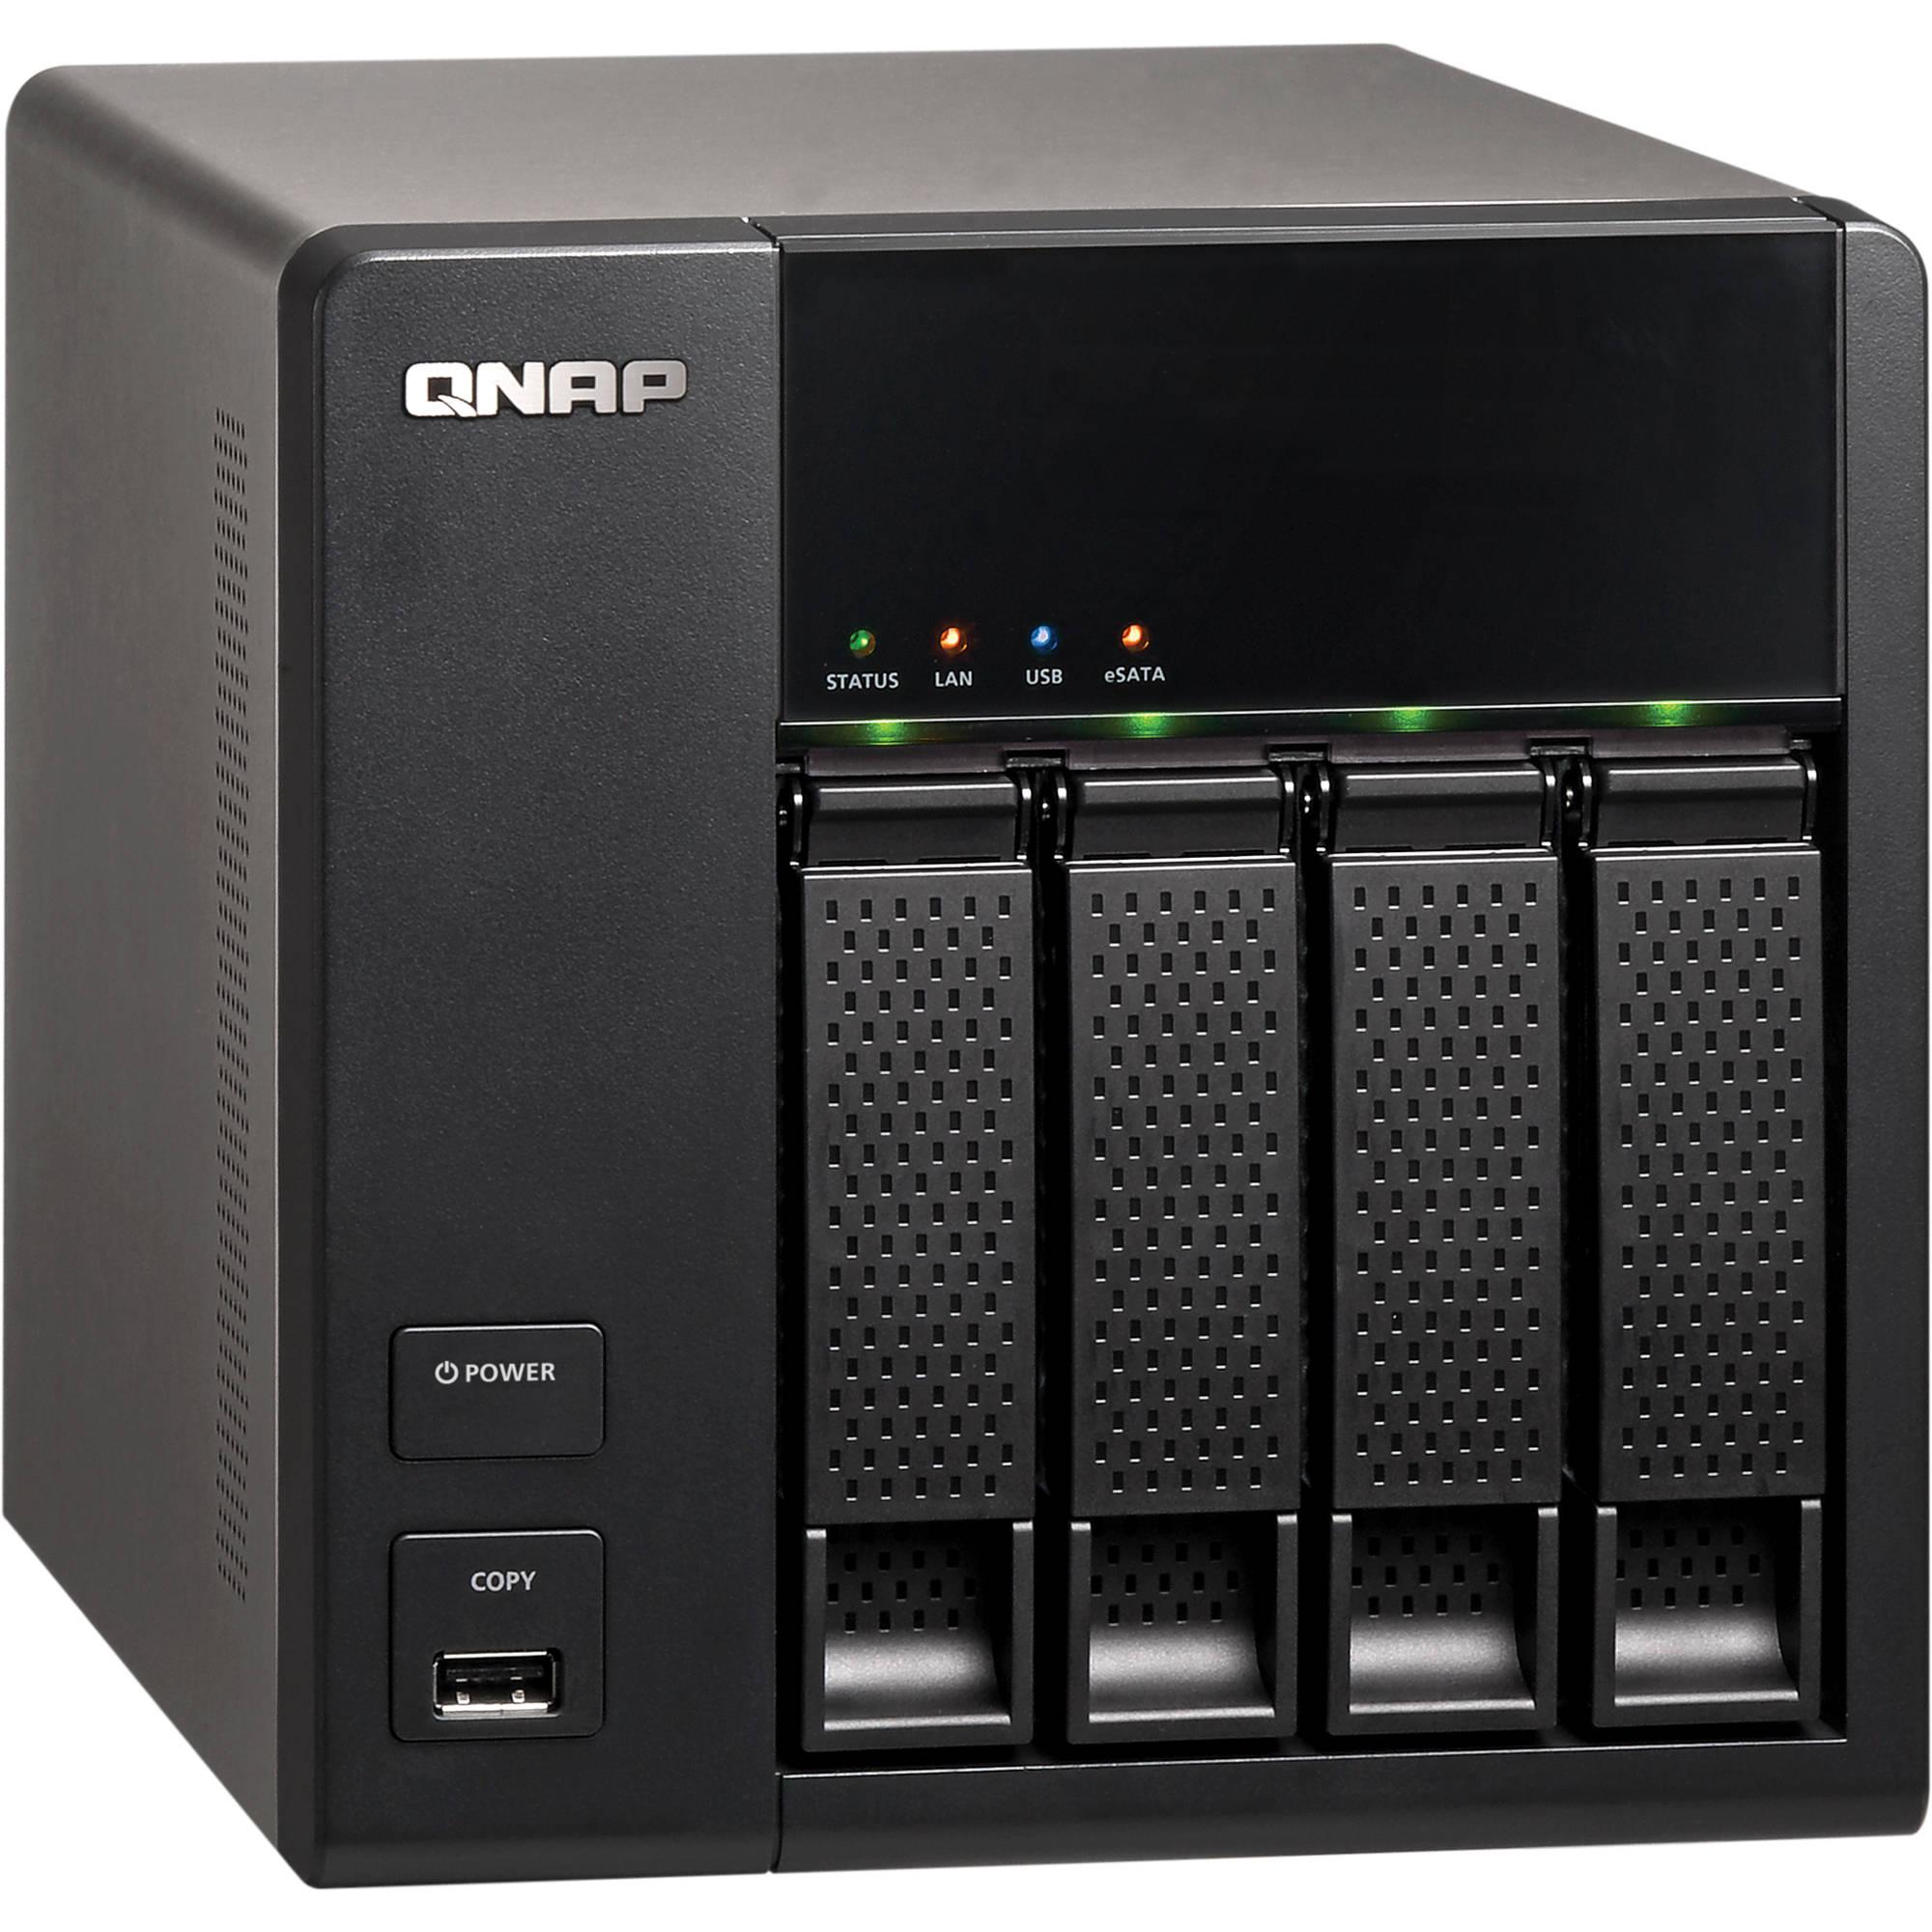 QNAP TS-412 Turbo NAS Server